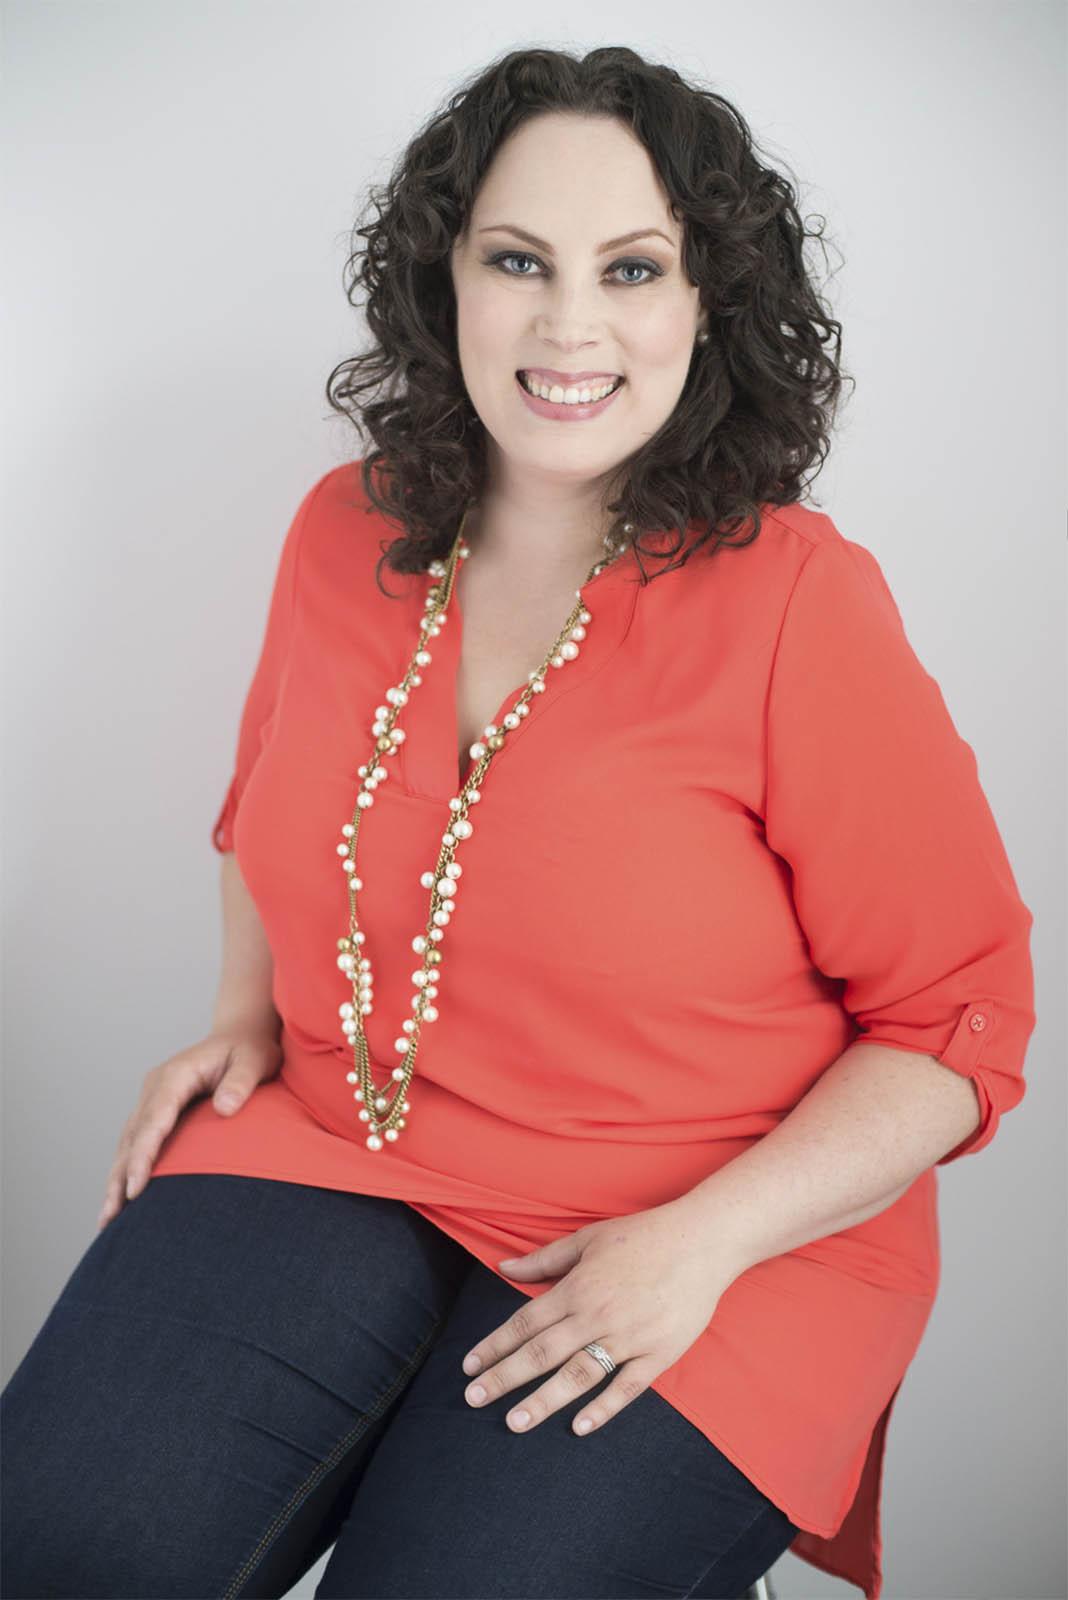 Chelsey Luren Portraits - Eating Disorder Recovery Photoshoot   Nicole Testimonial3.jpg